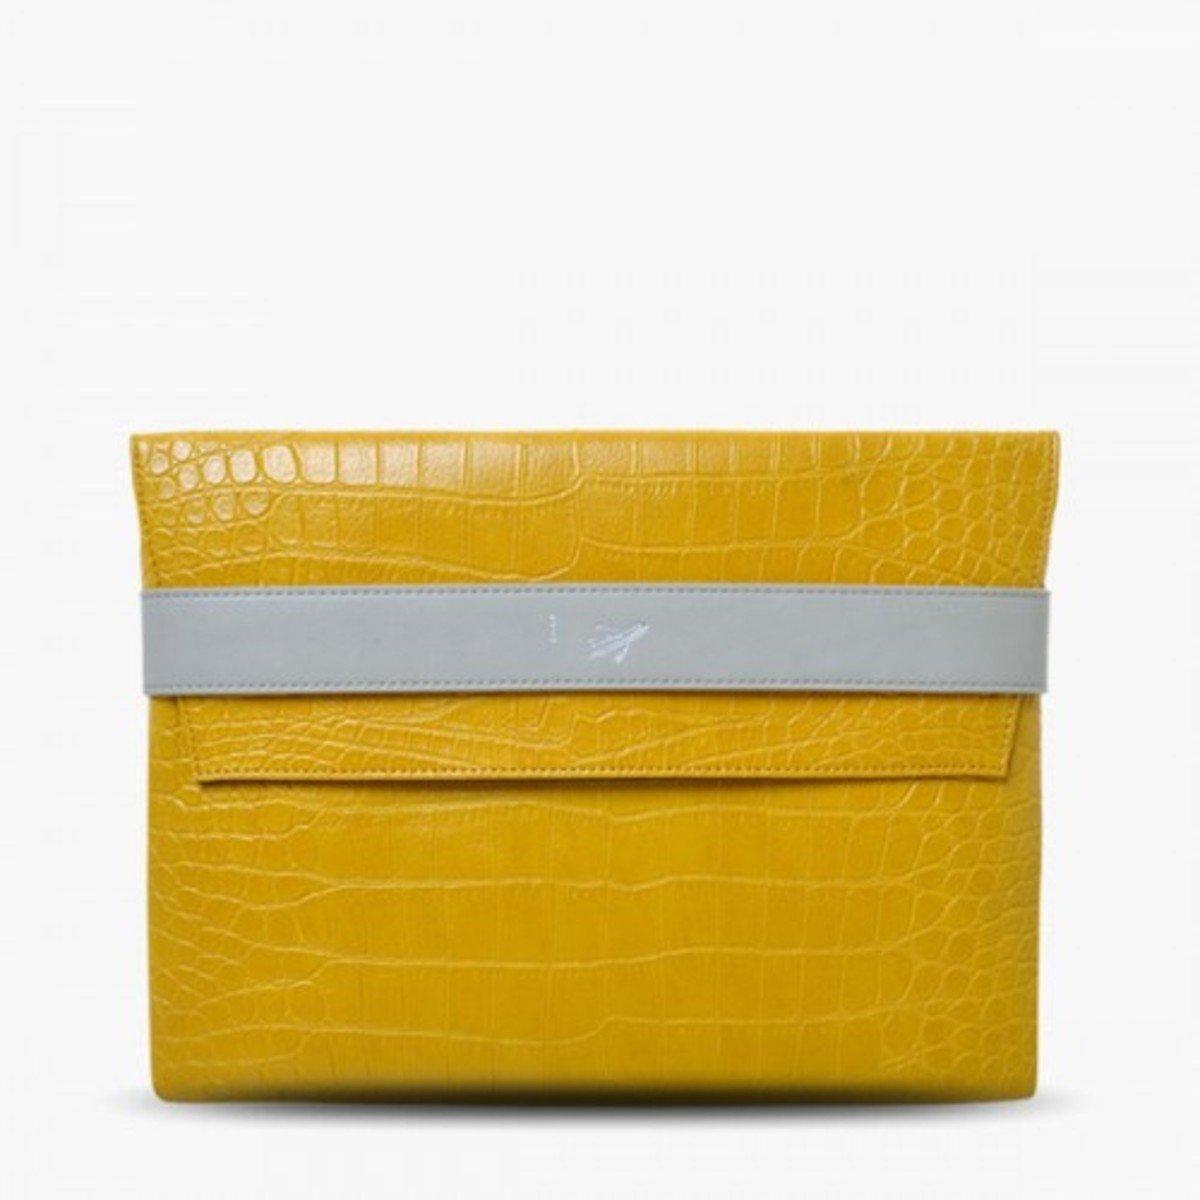 New Iann 手提包 (黃)_P00000FO